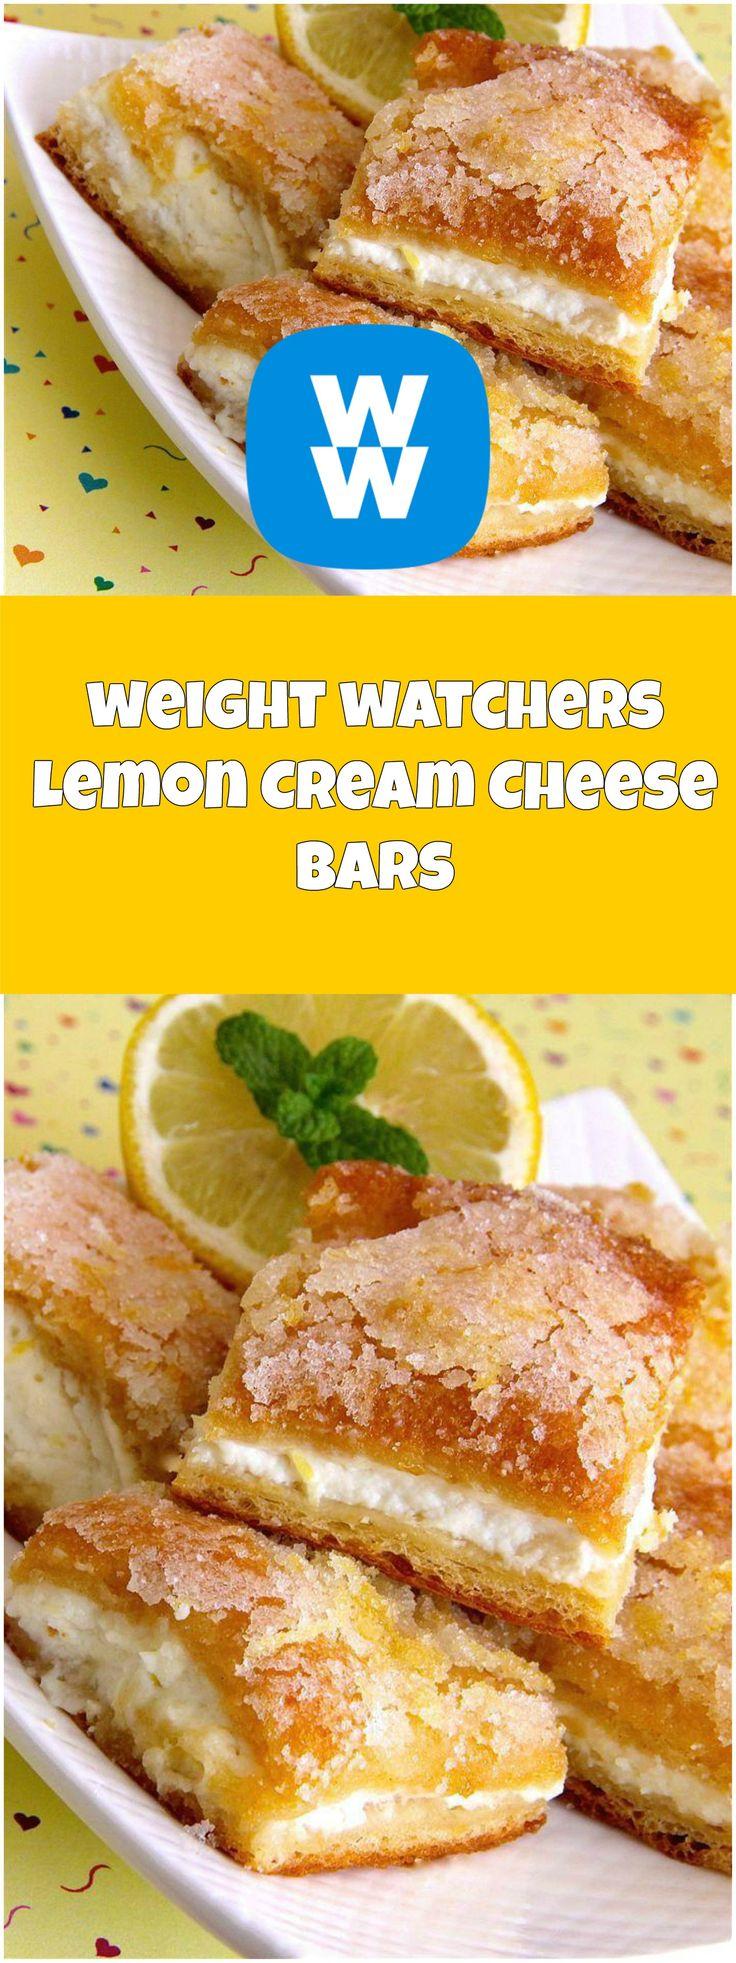 Lemon Cream Cheese Bars | weight watchers recipes | Page 2